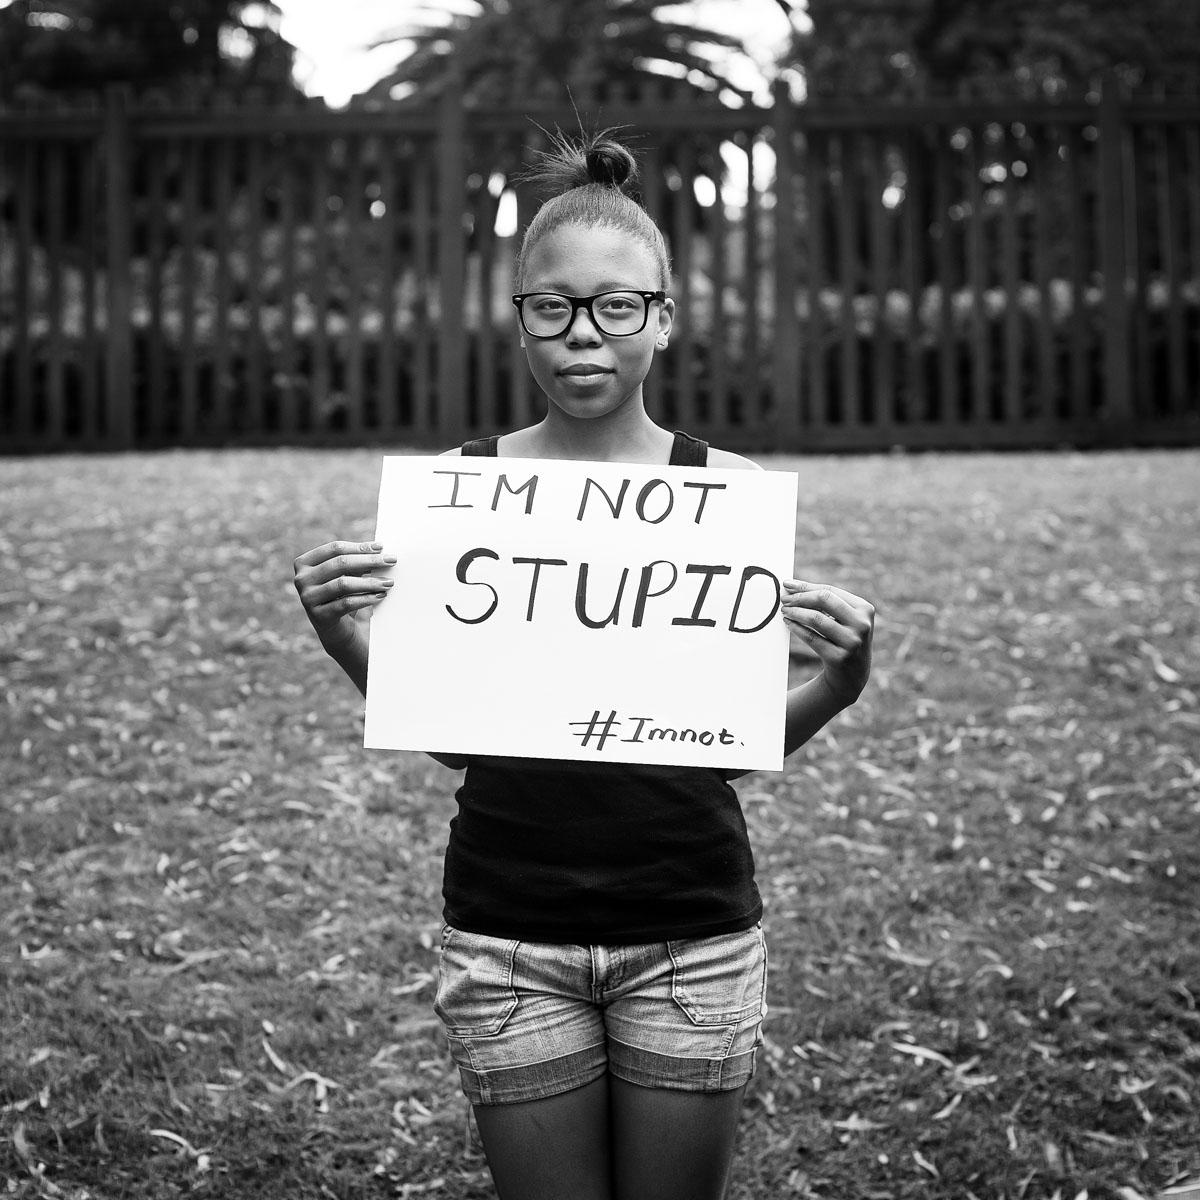 #Imnot stupid